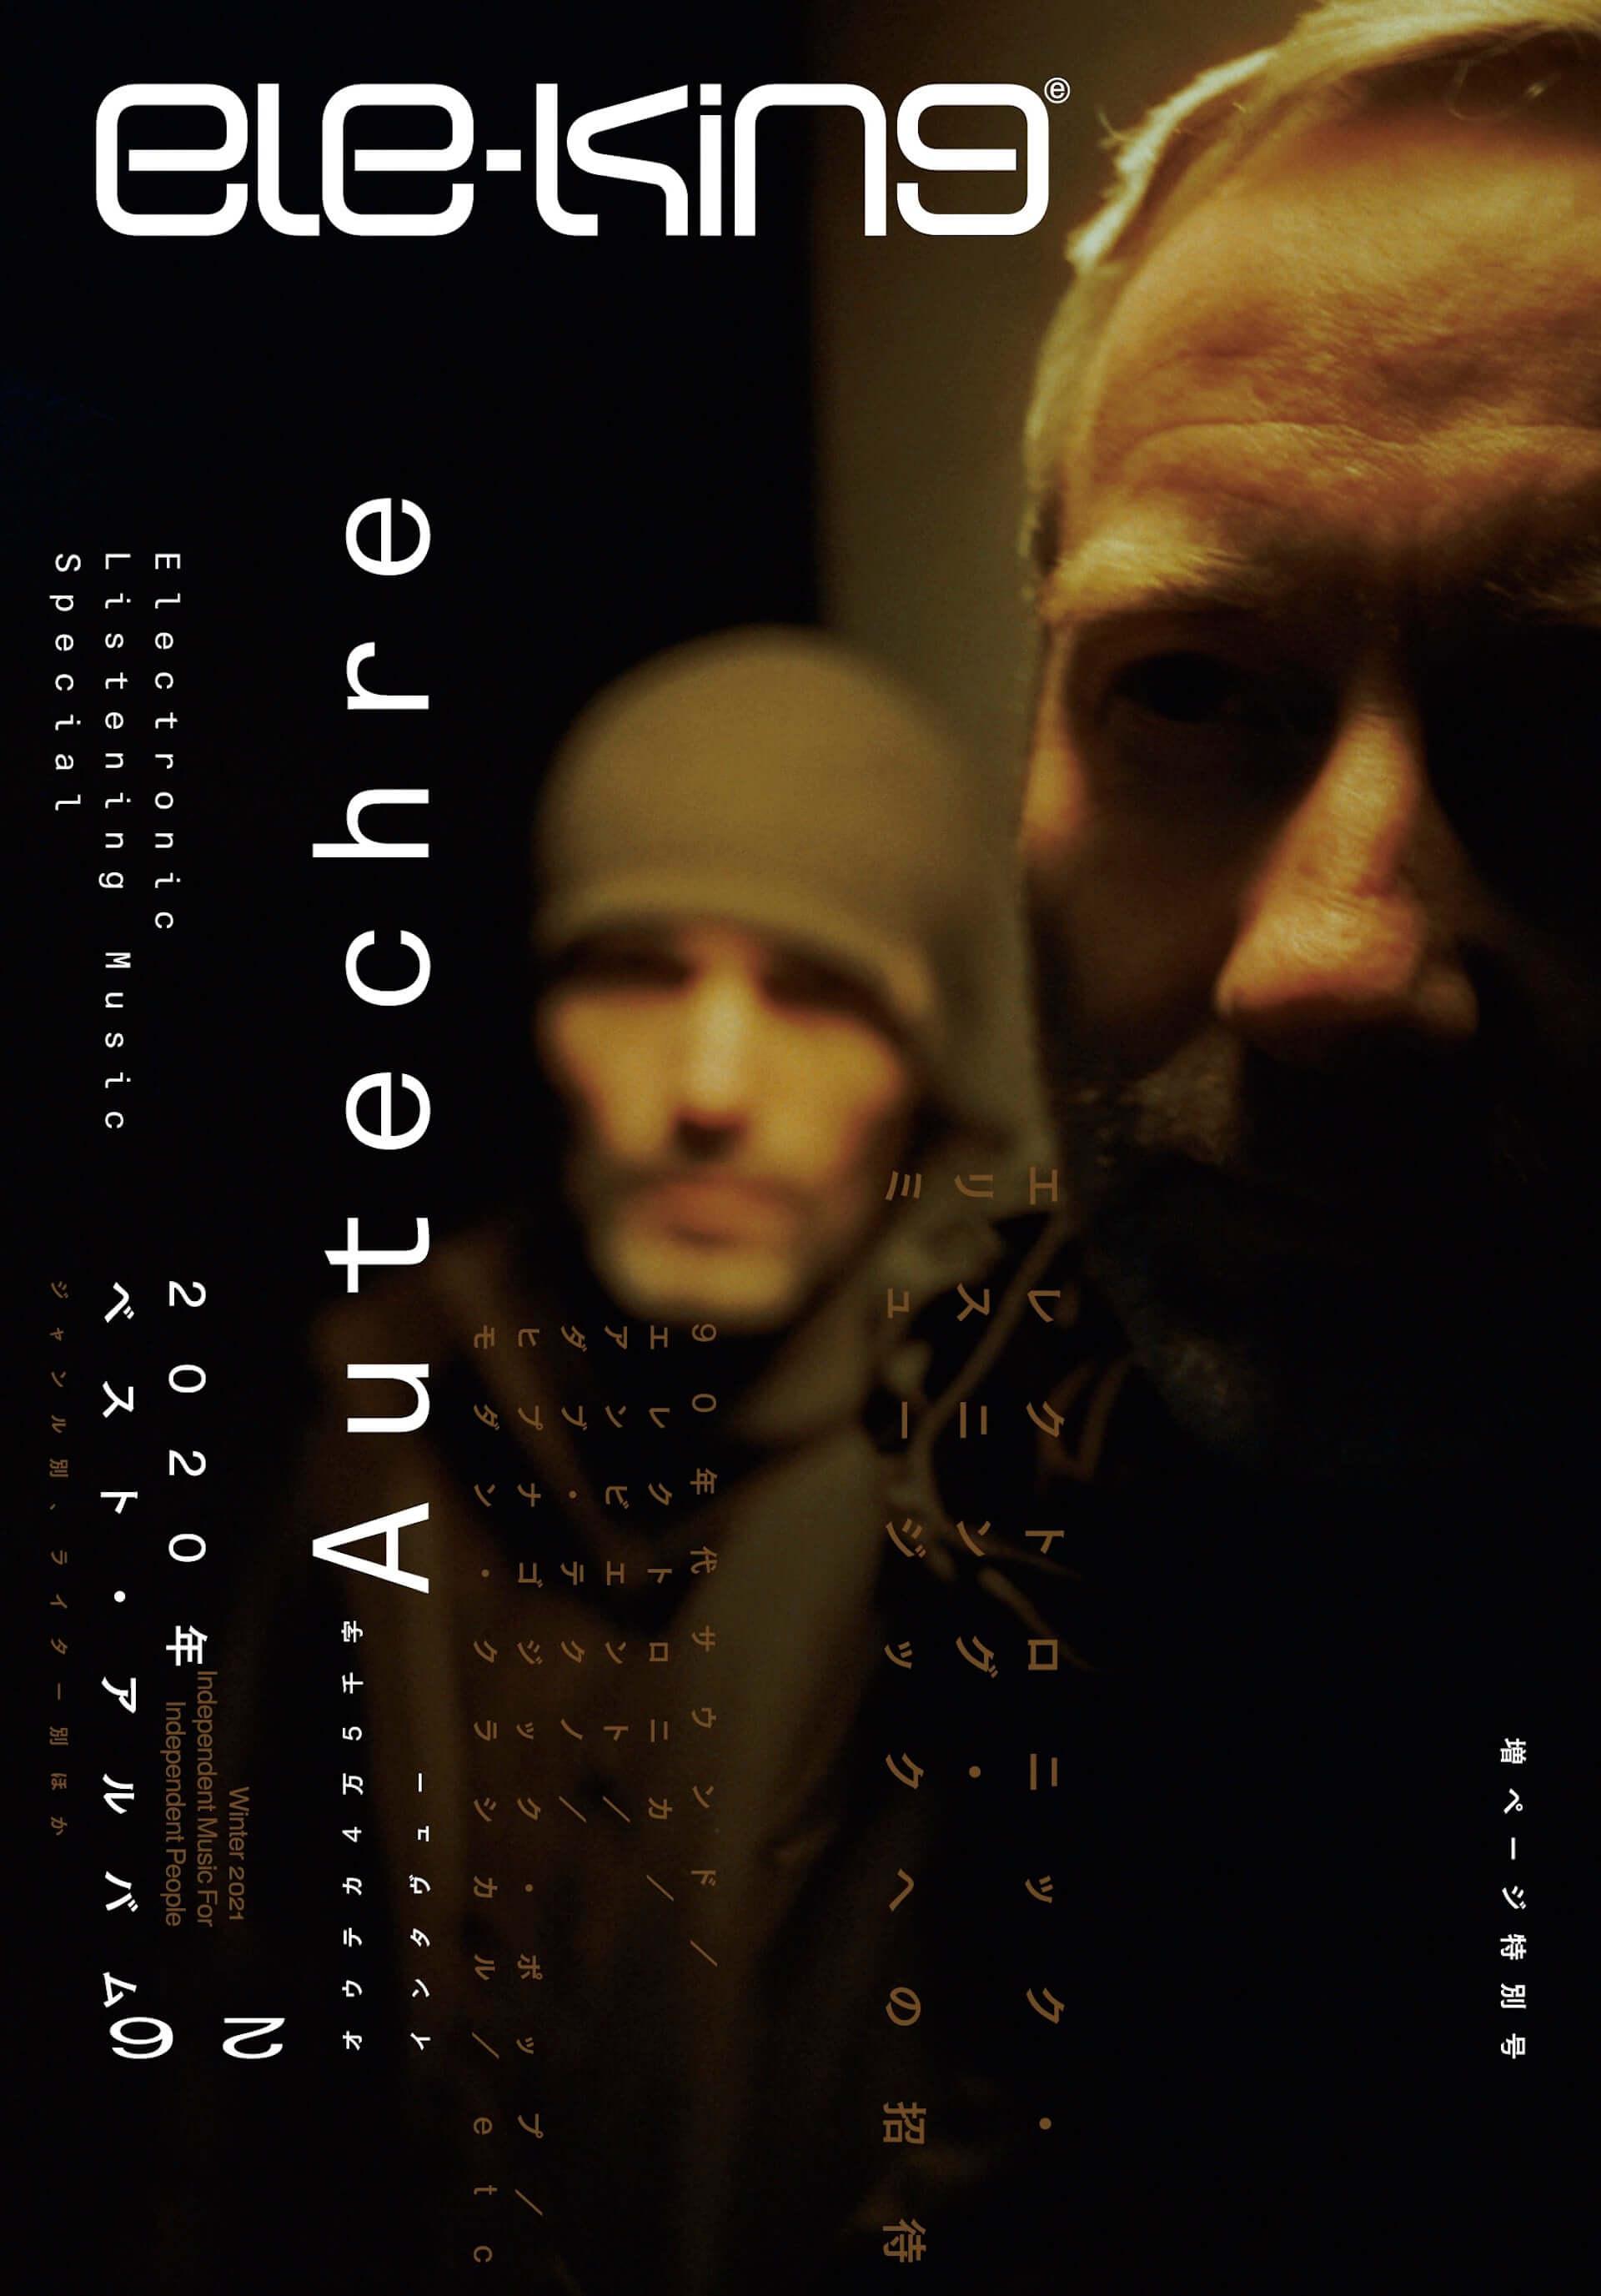 Autechreの4万5千字インタビューや原摩利彦、tofubeatsらによる2020年個人チャートも収録!ele-king年末号が特別仕様で刊行 art201225_ele-king_1-1920x2753